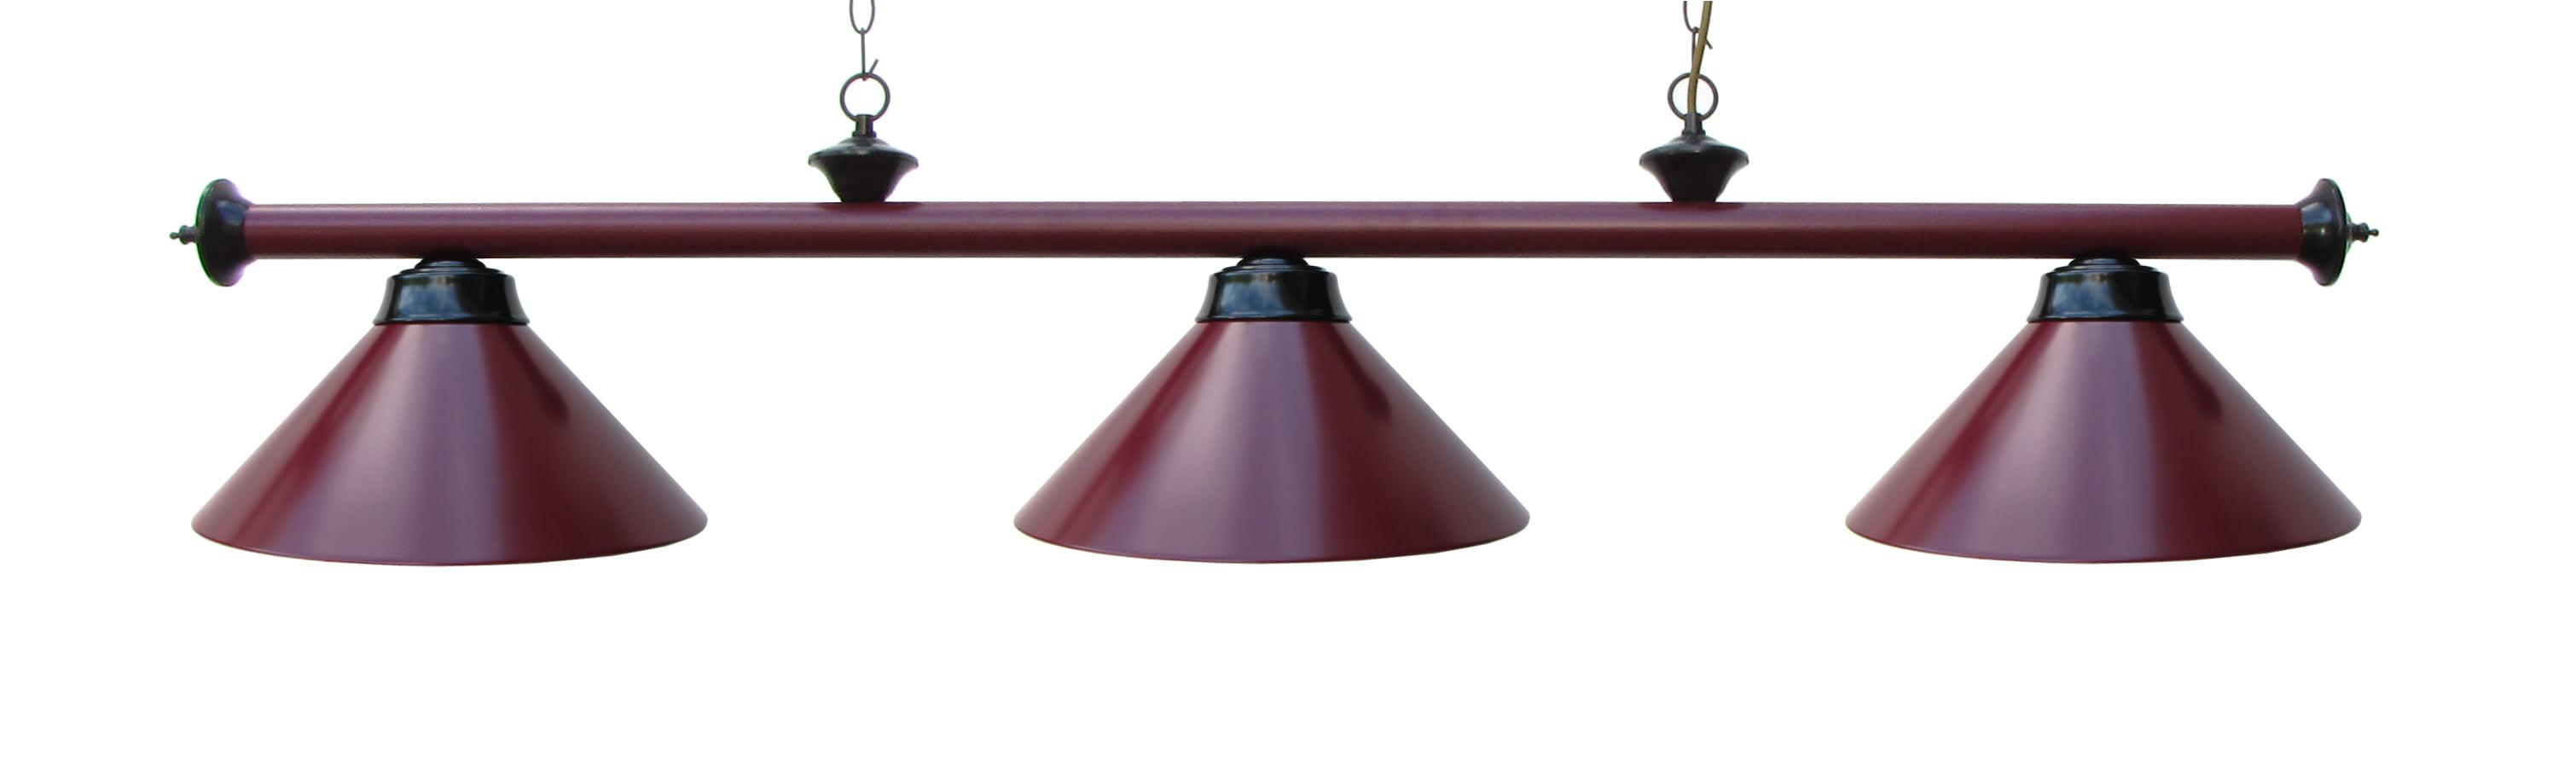 59 Pool Table Light Billiard Lamp Burdy Black With Metal Shades Com